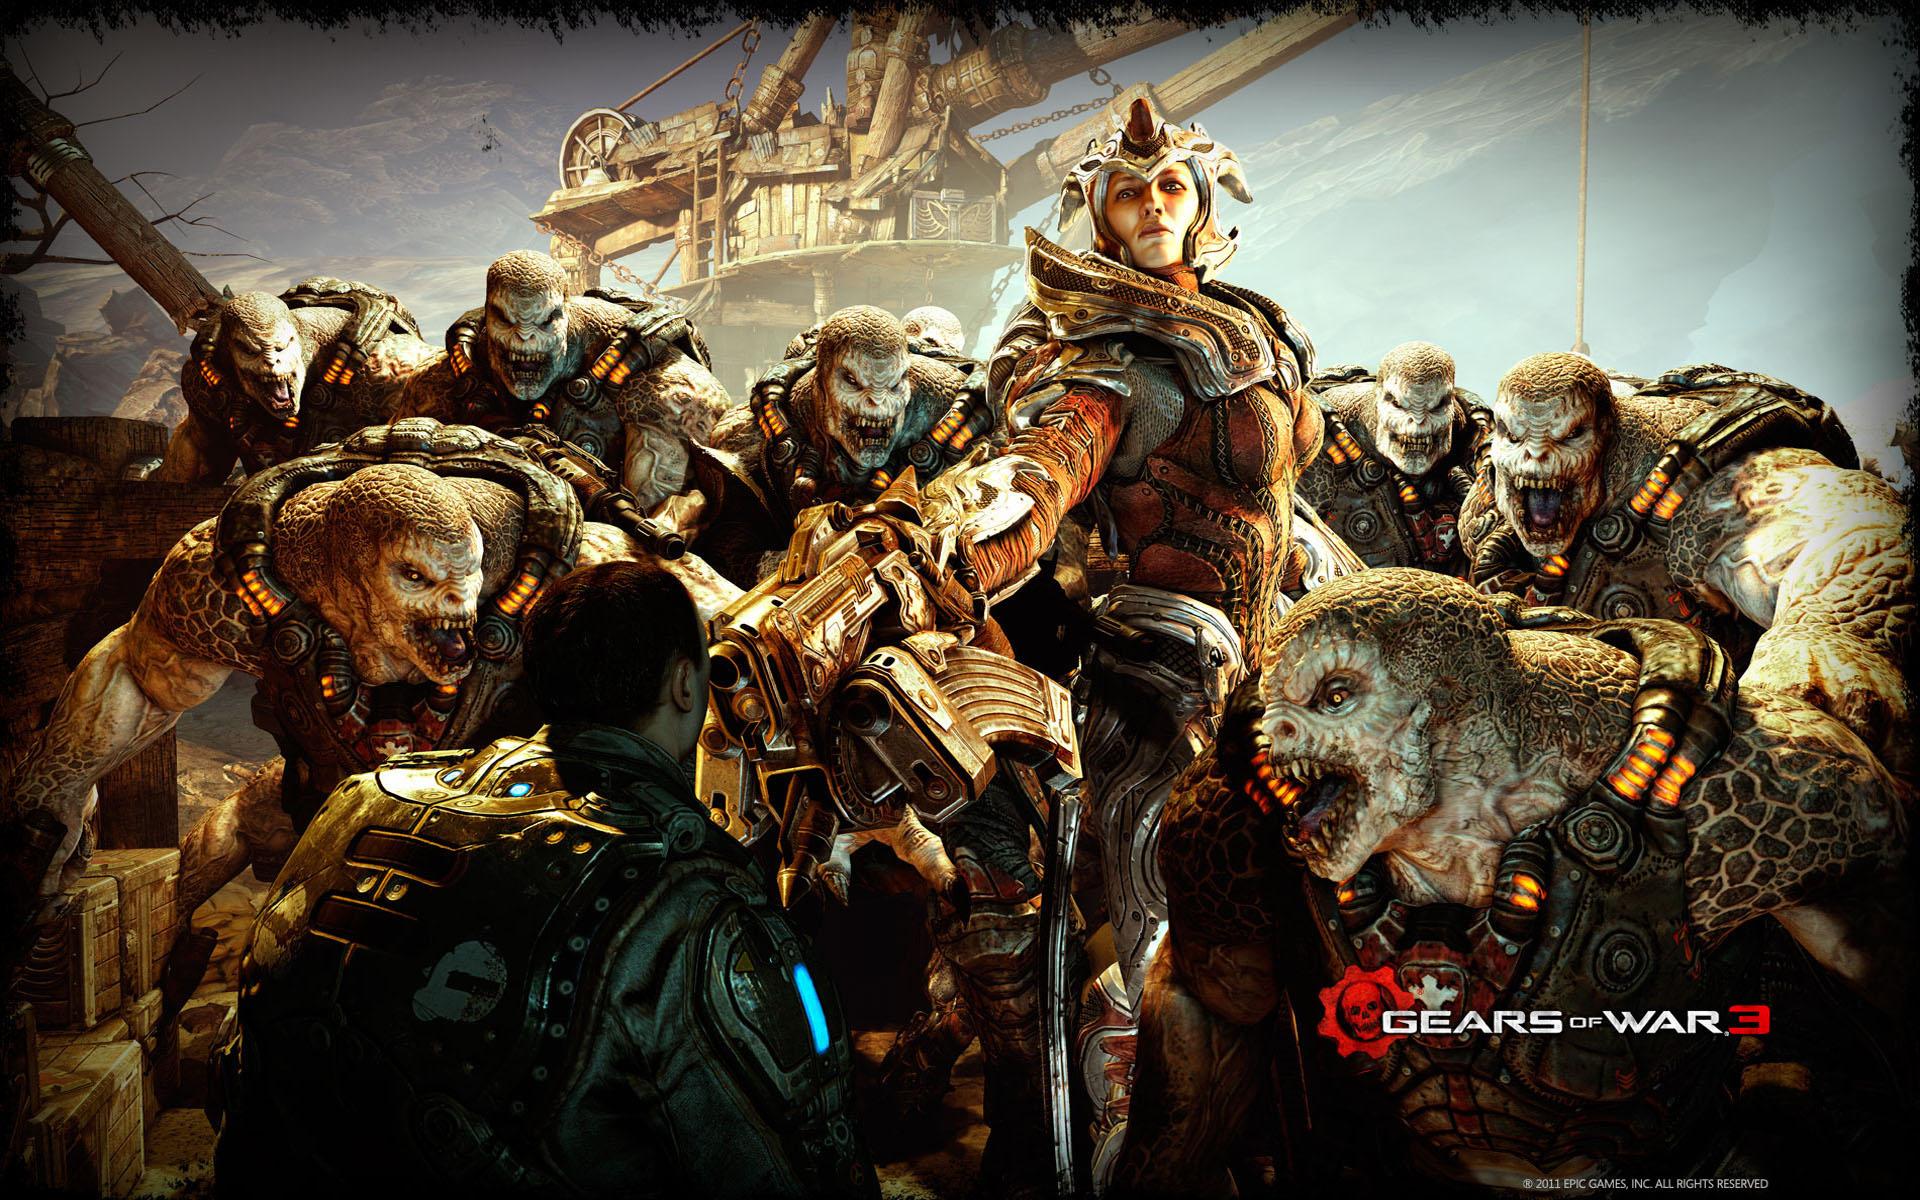 Gears of War 3 2011 Wallpapers HD Wallpapers 1920x1200